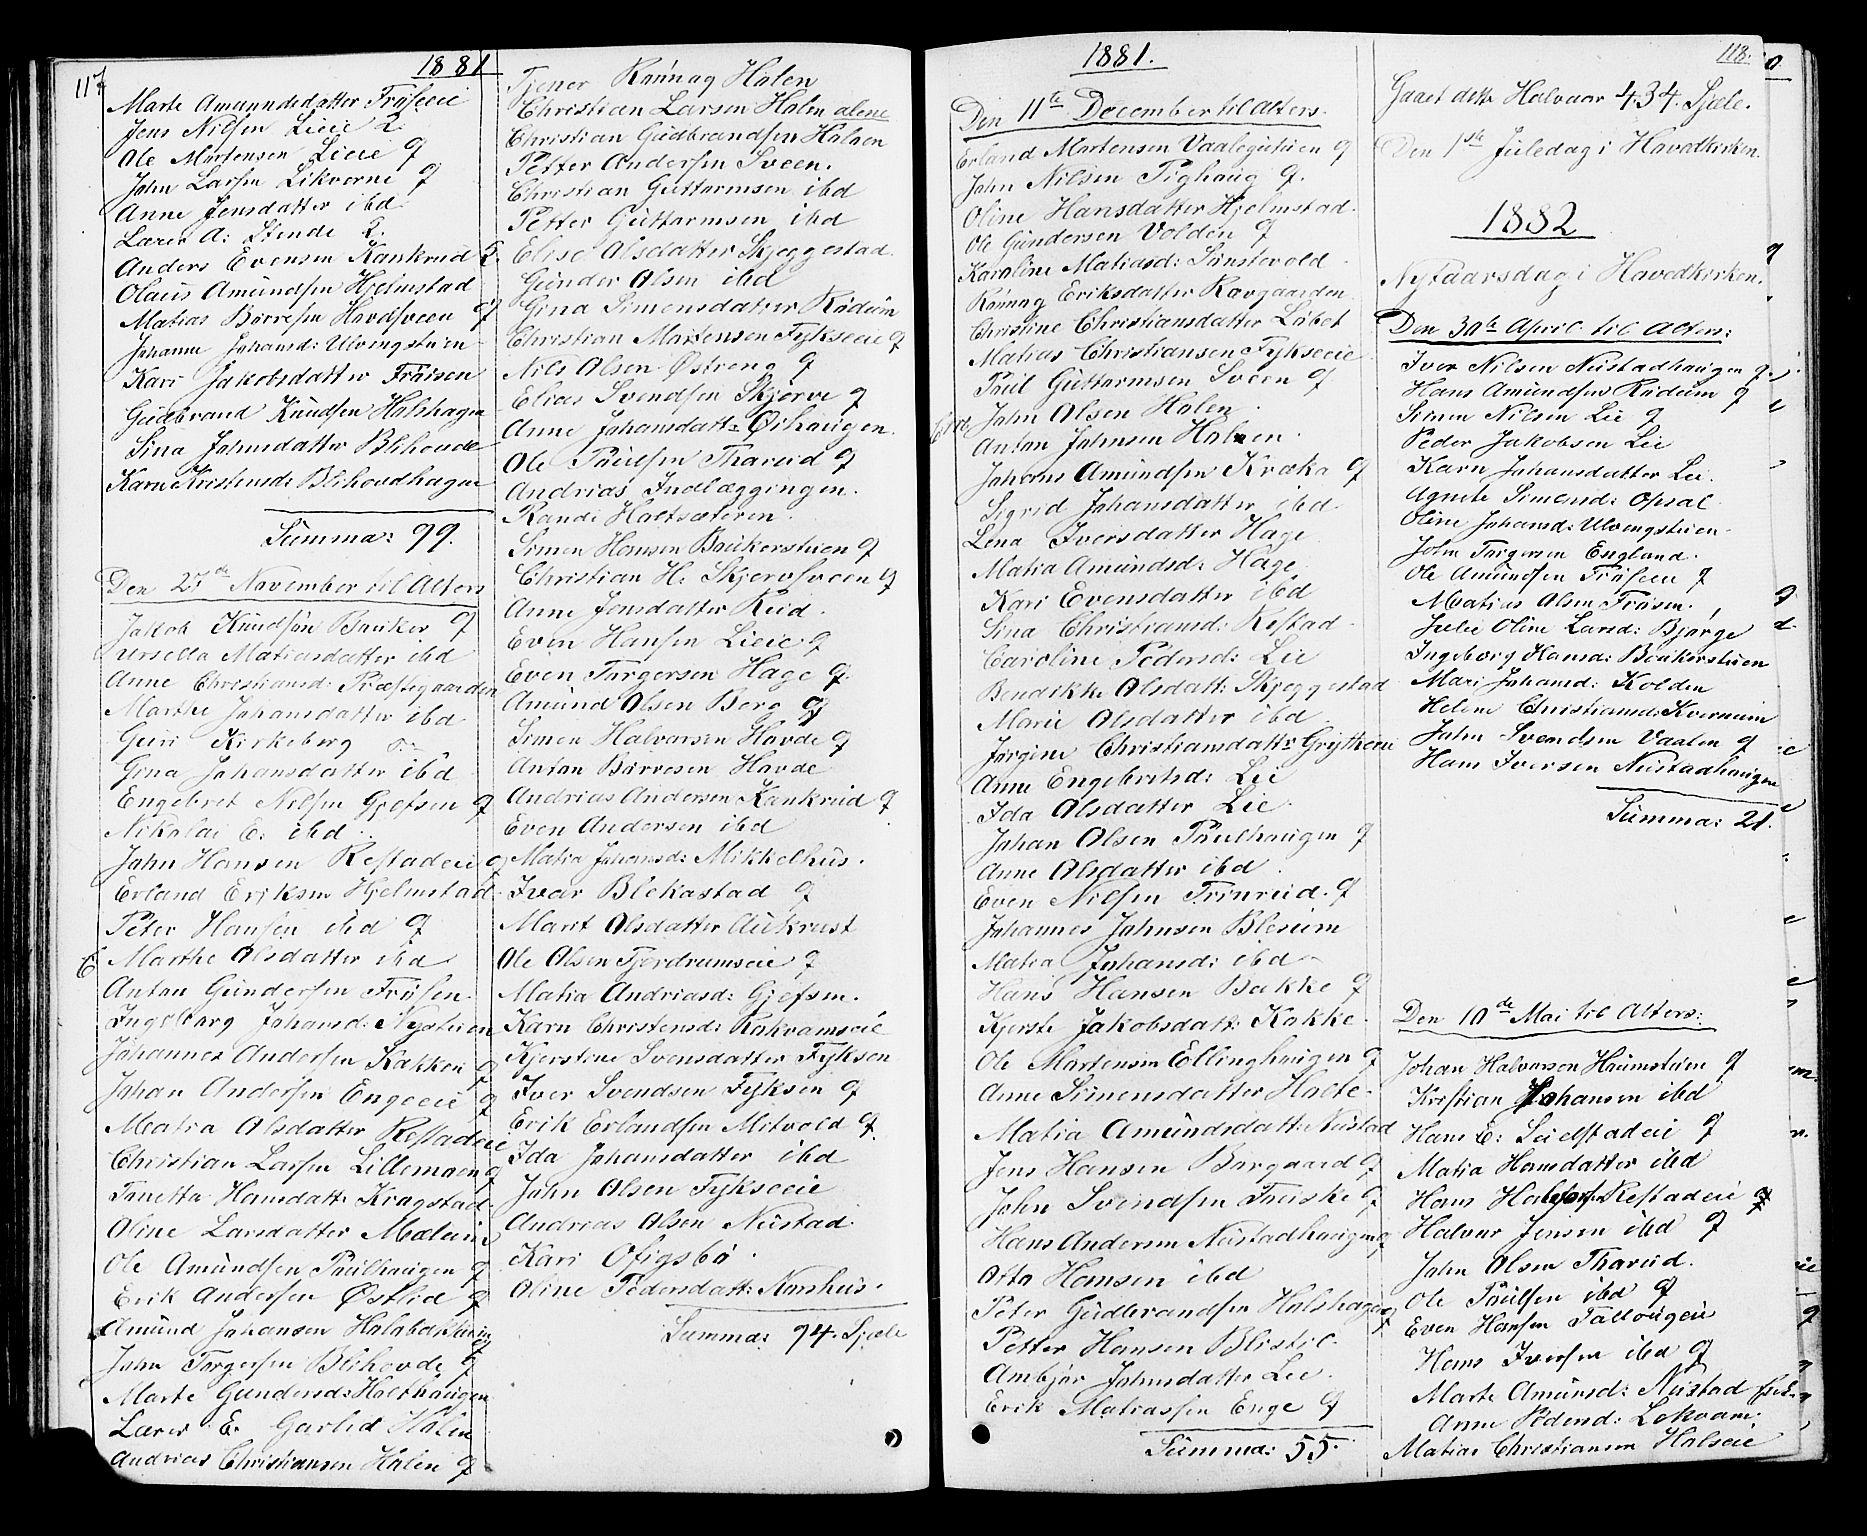 SAH, Østre Gausdal prestekontor, Klokkerbok nr. 1, 1863-1893, s. 117-118